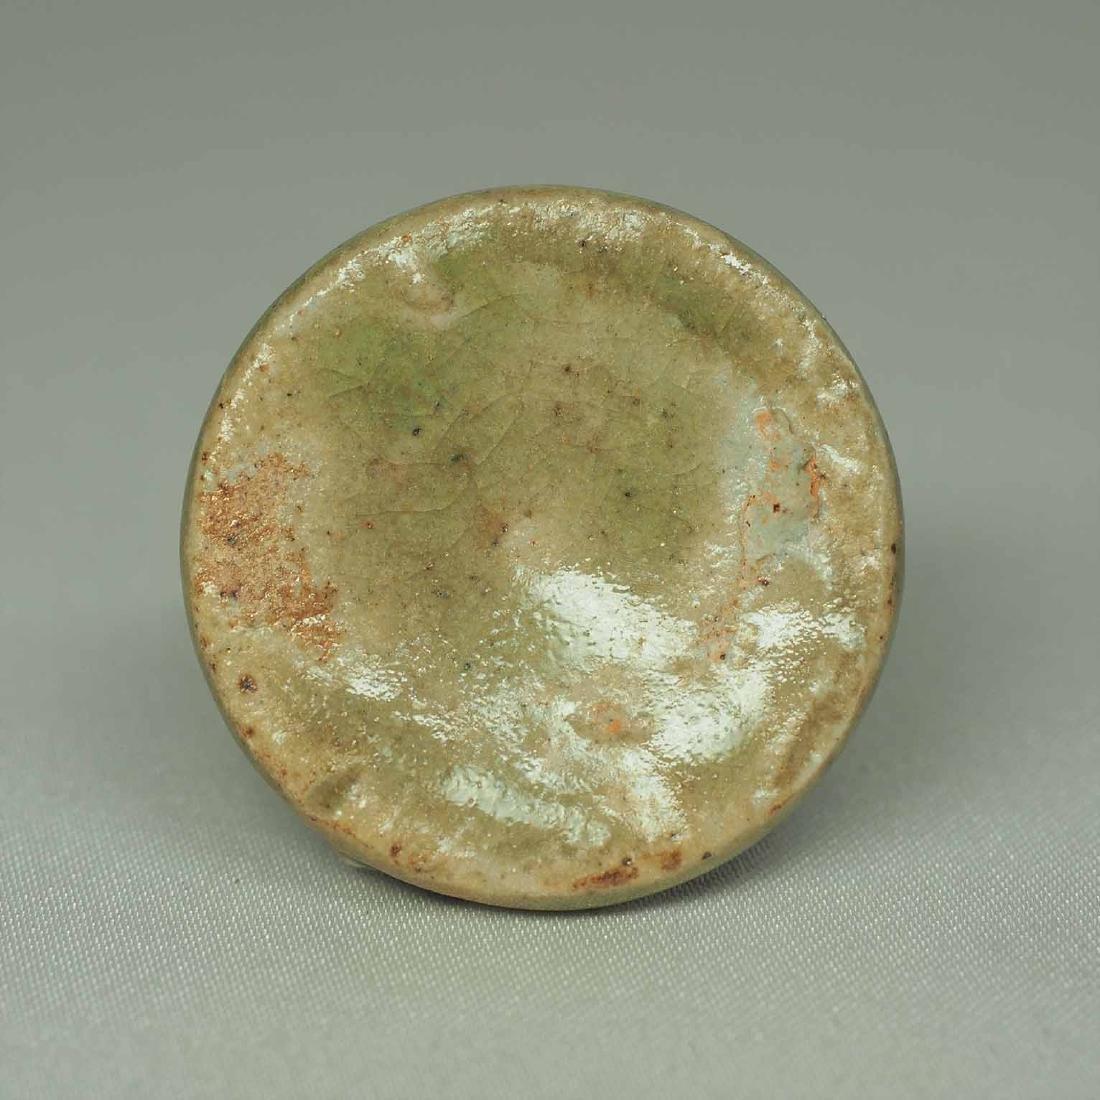 Lidded Water Pot with Brown Spot, Eastern Jin Dynasty - 5